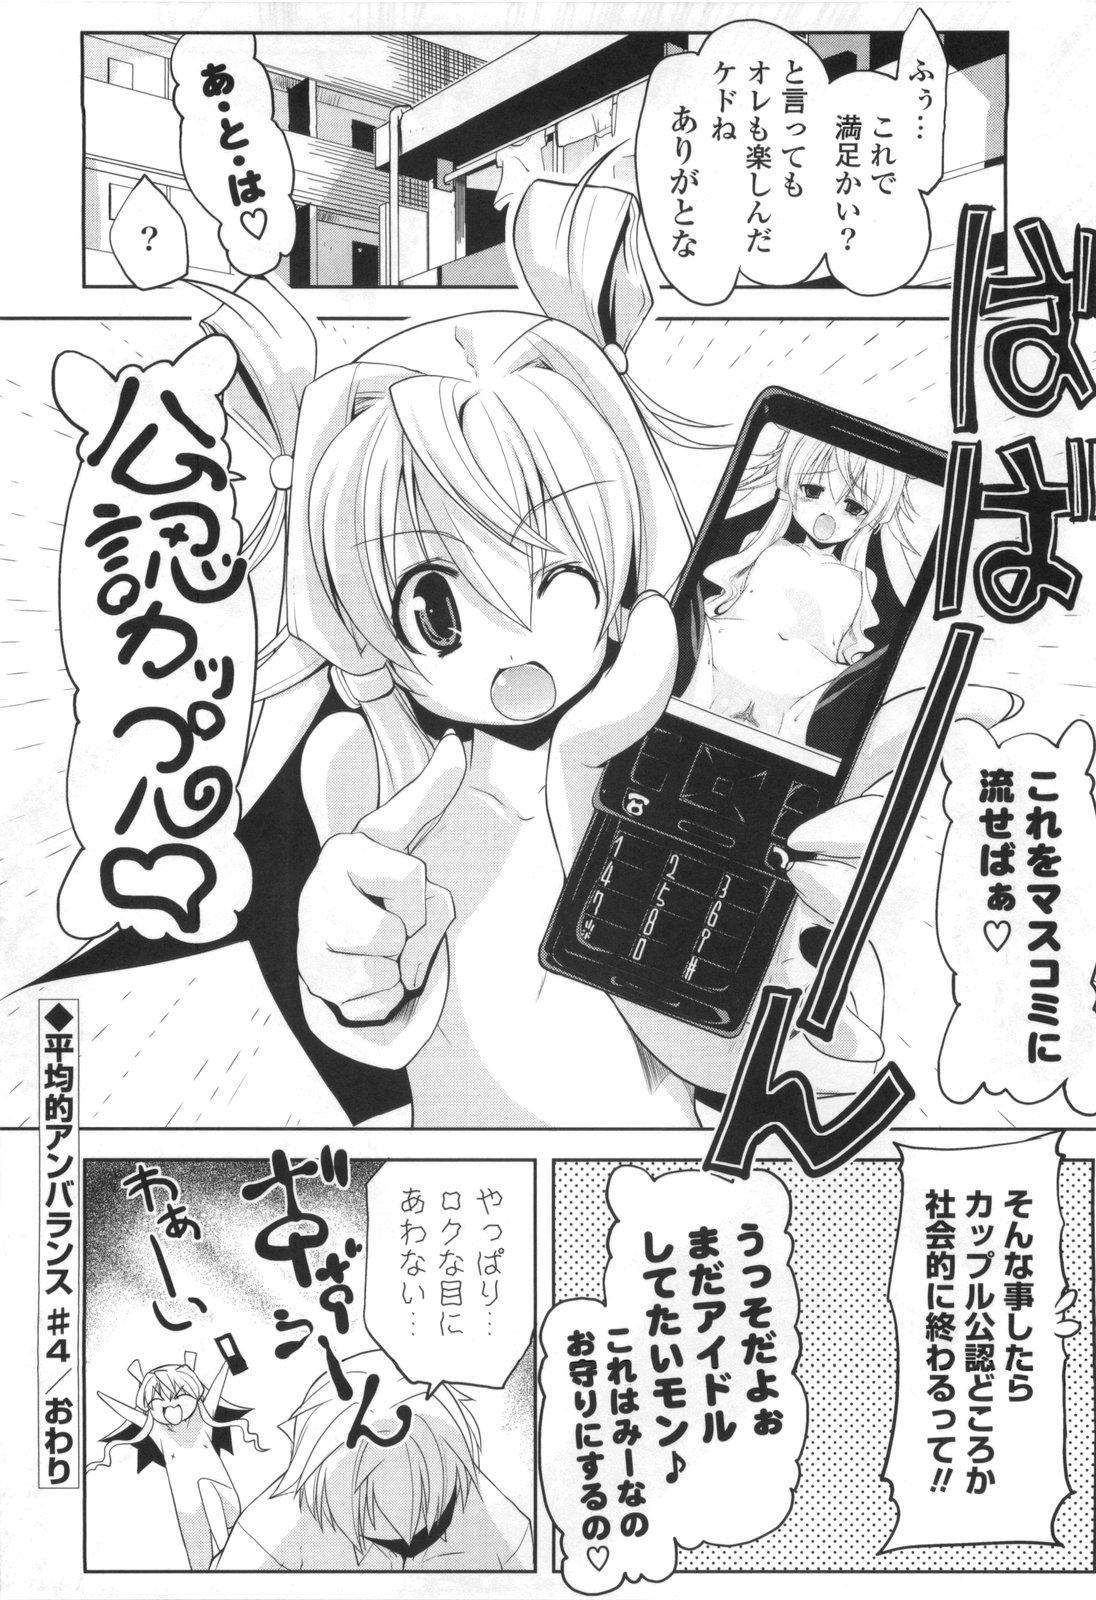 [Gyonikun] Gosyujin-sama Senyou!? Ami-sama Senyou 95